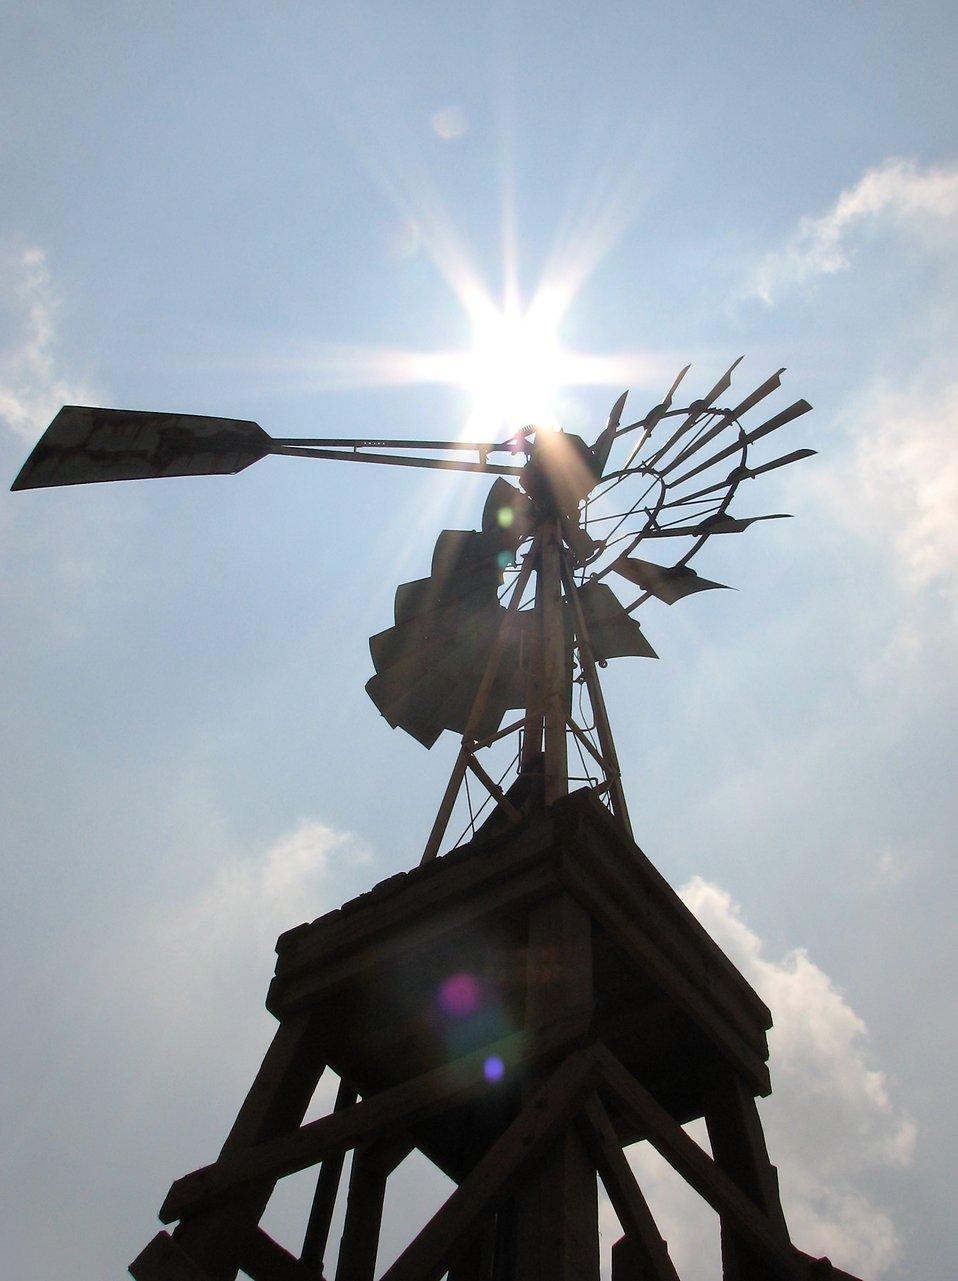 An old farm windmill shining under the sun : Free Stock Photo